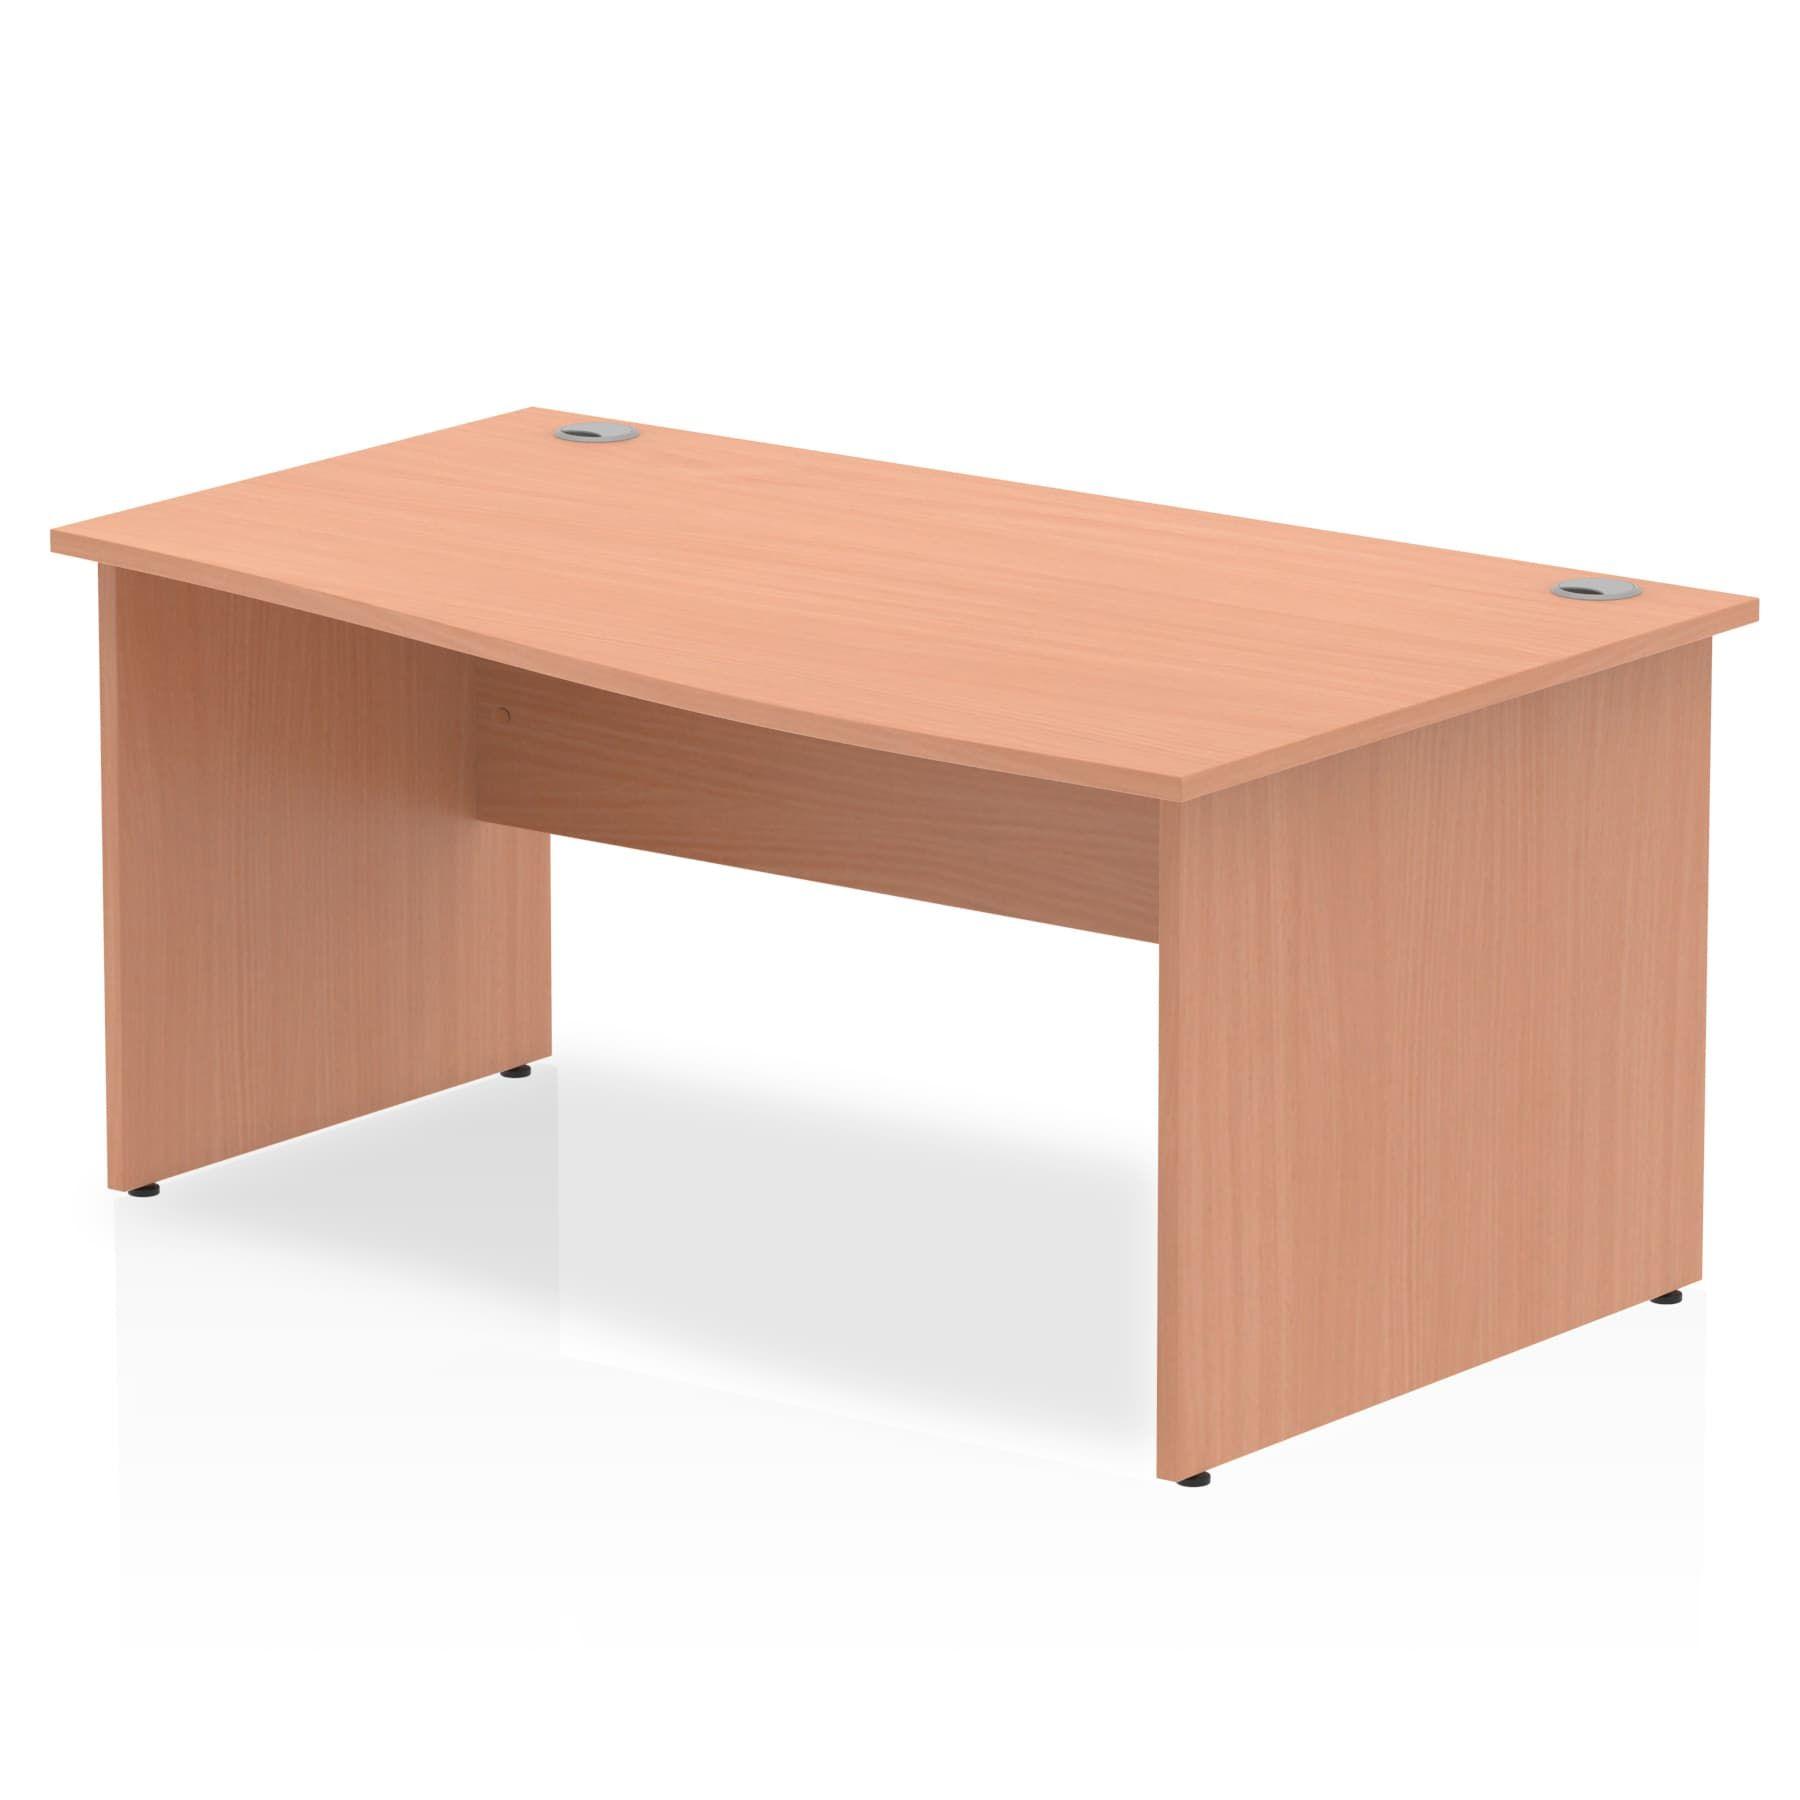 Impulse 1600 Right Hand Wave Desk